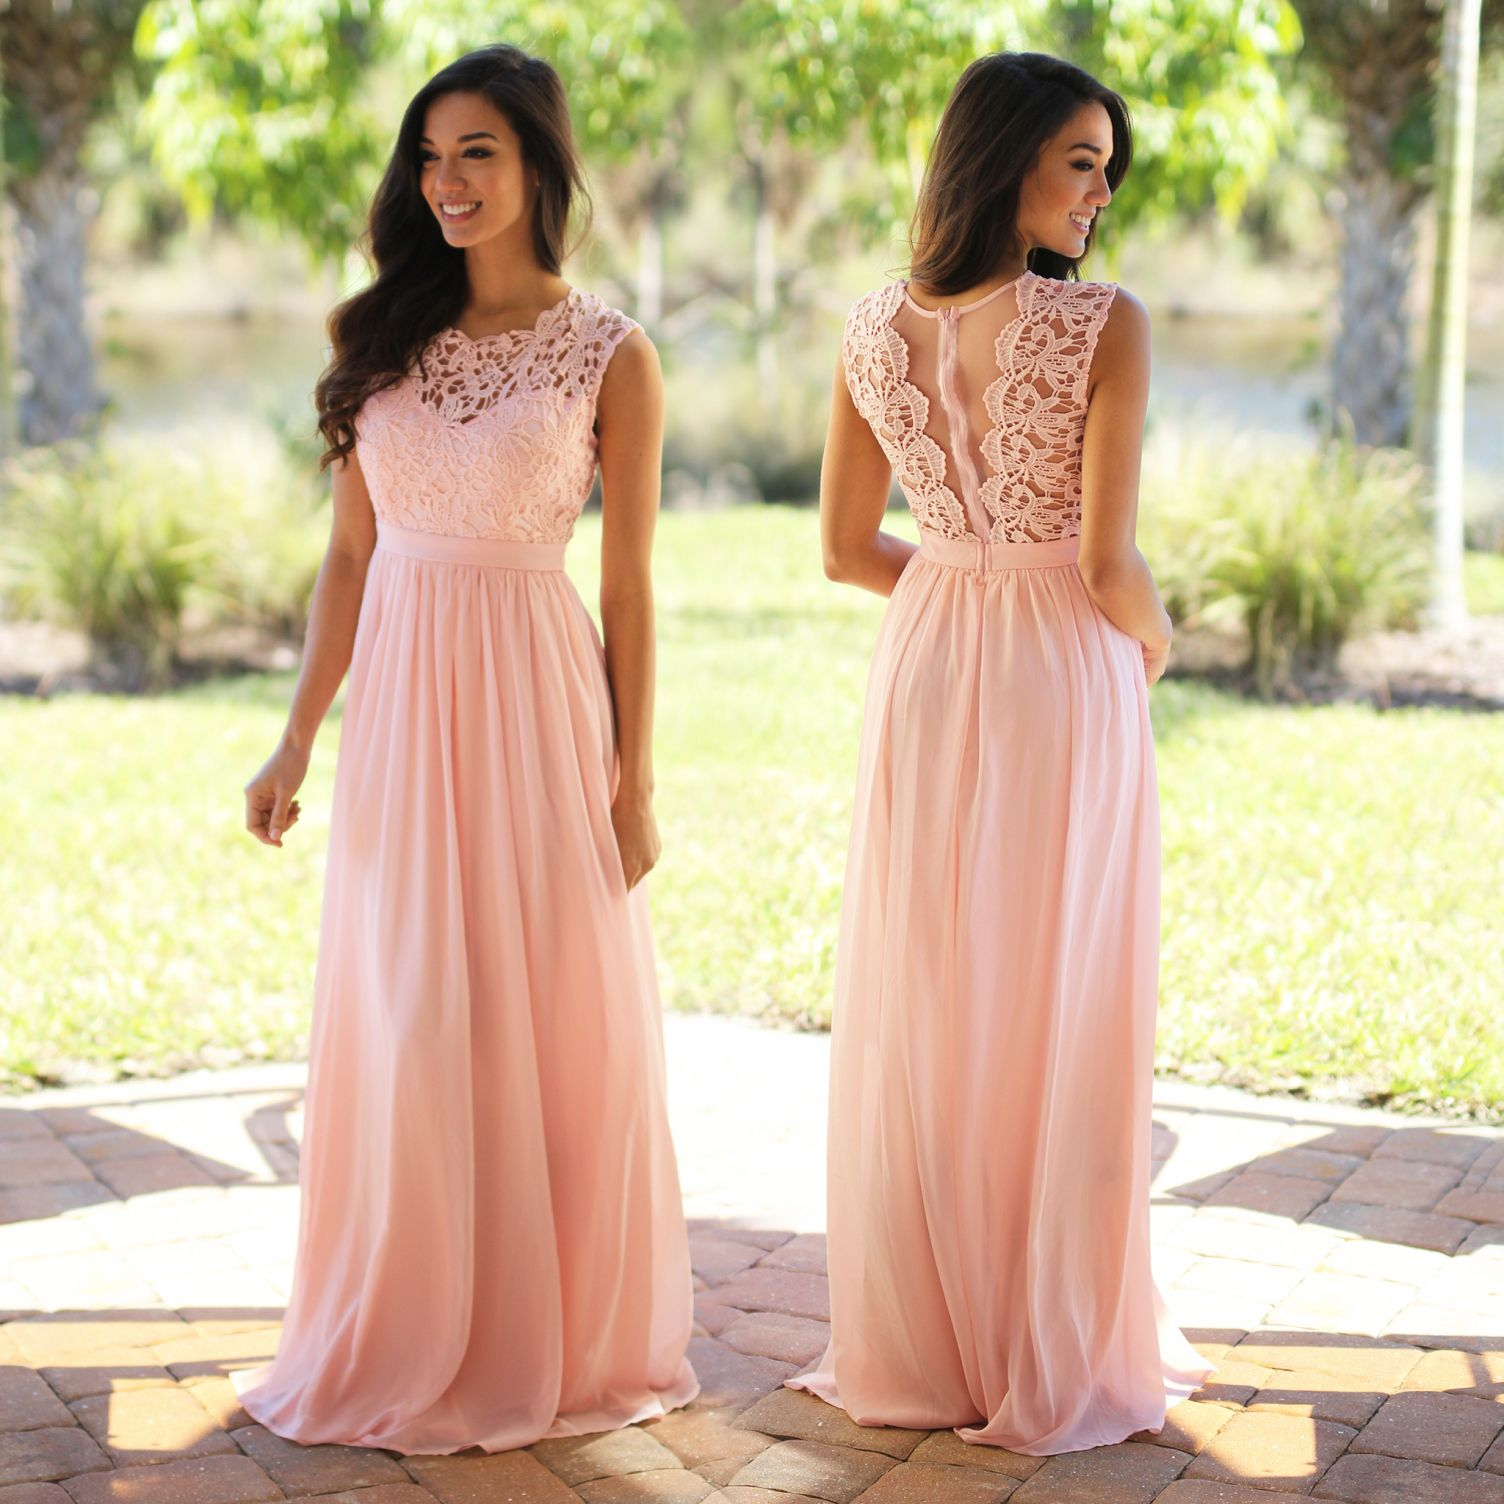 Pin by Annora on Popular Wedding Dress  Pinterest  Maxi dresses